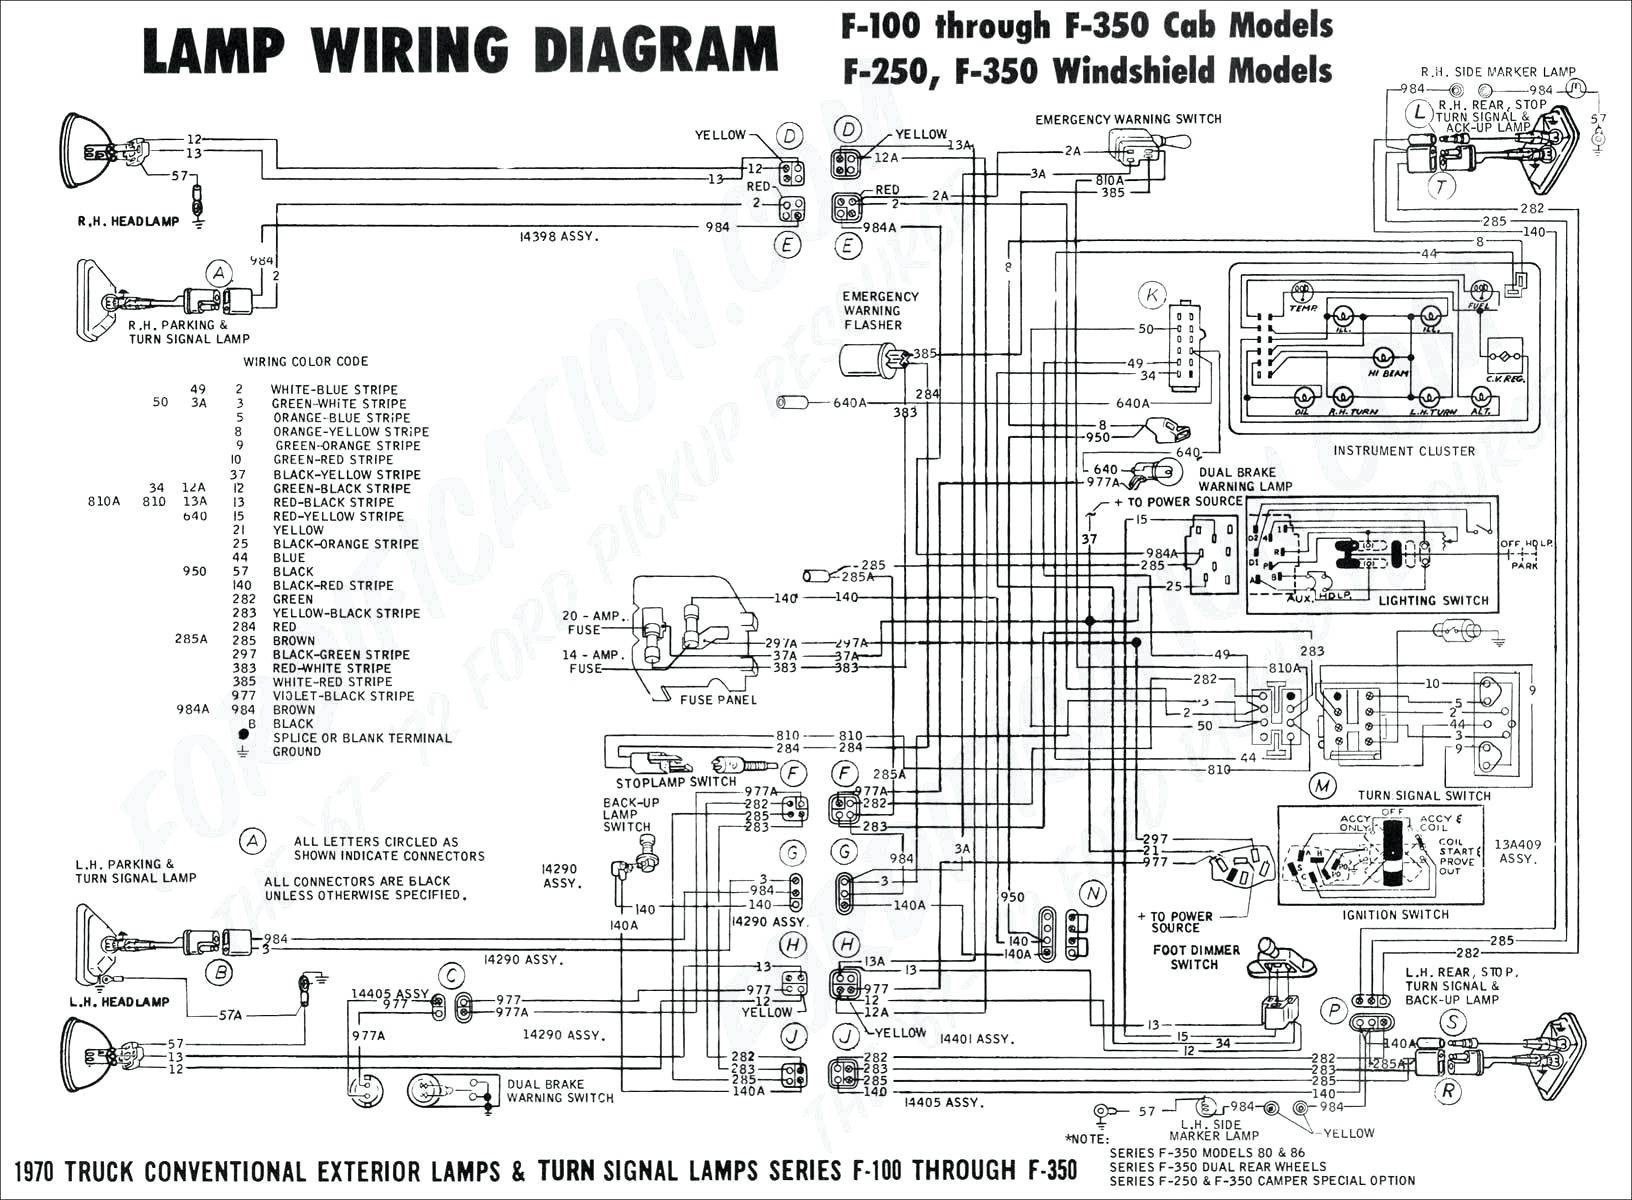 chevy silverado tail light wiring diagram wiring diagram for bulkhead lights 2019 2005 chevy silverado tail light wiring diagram unique lovely trailer 1g